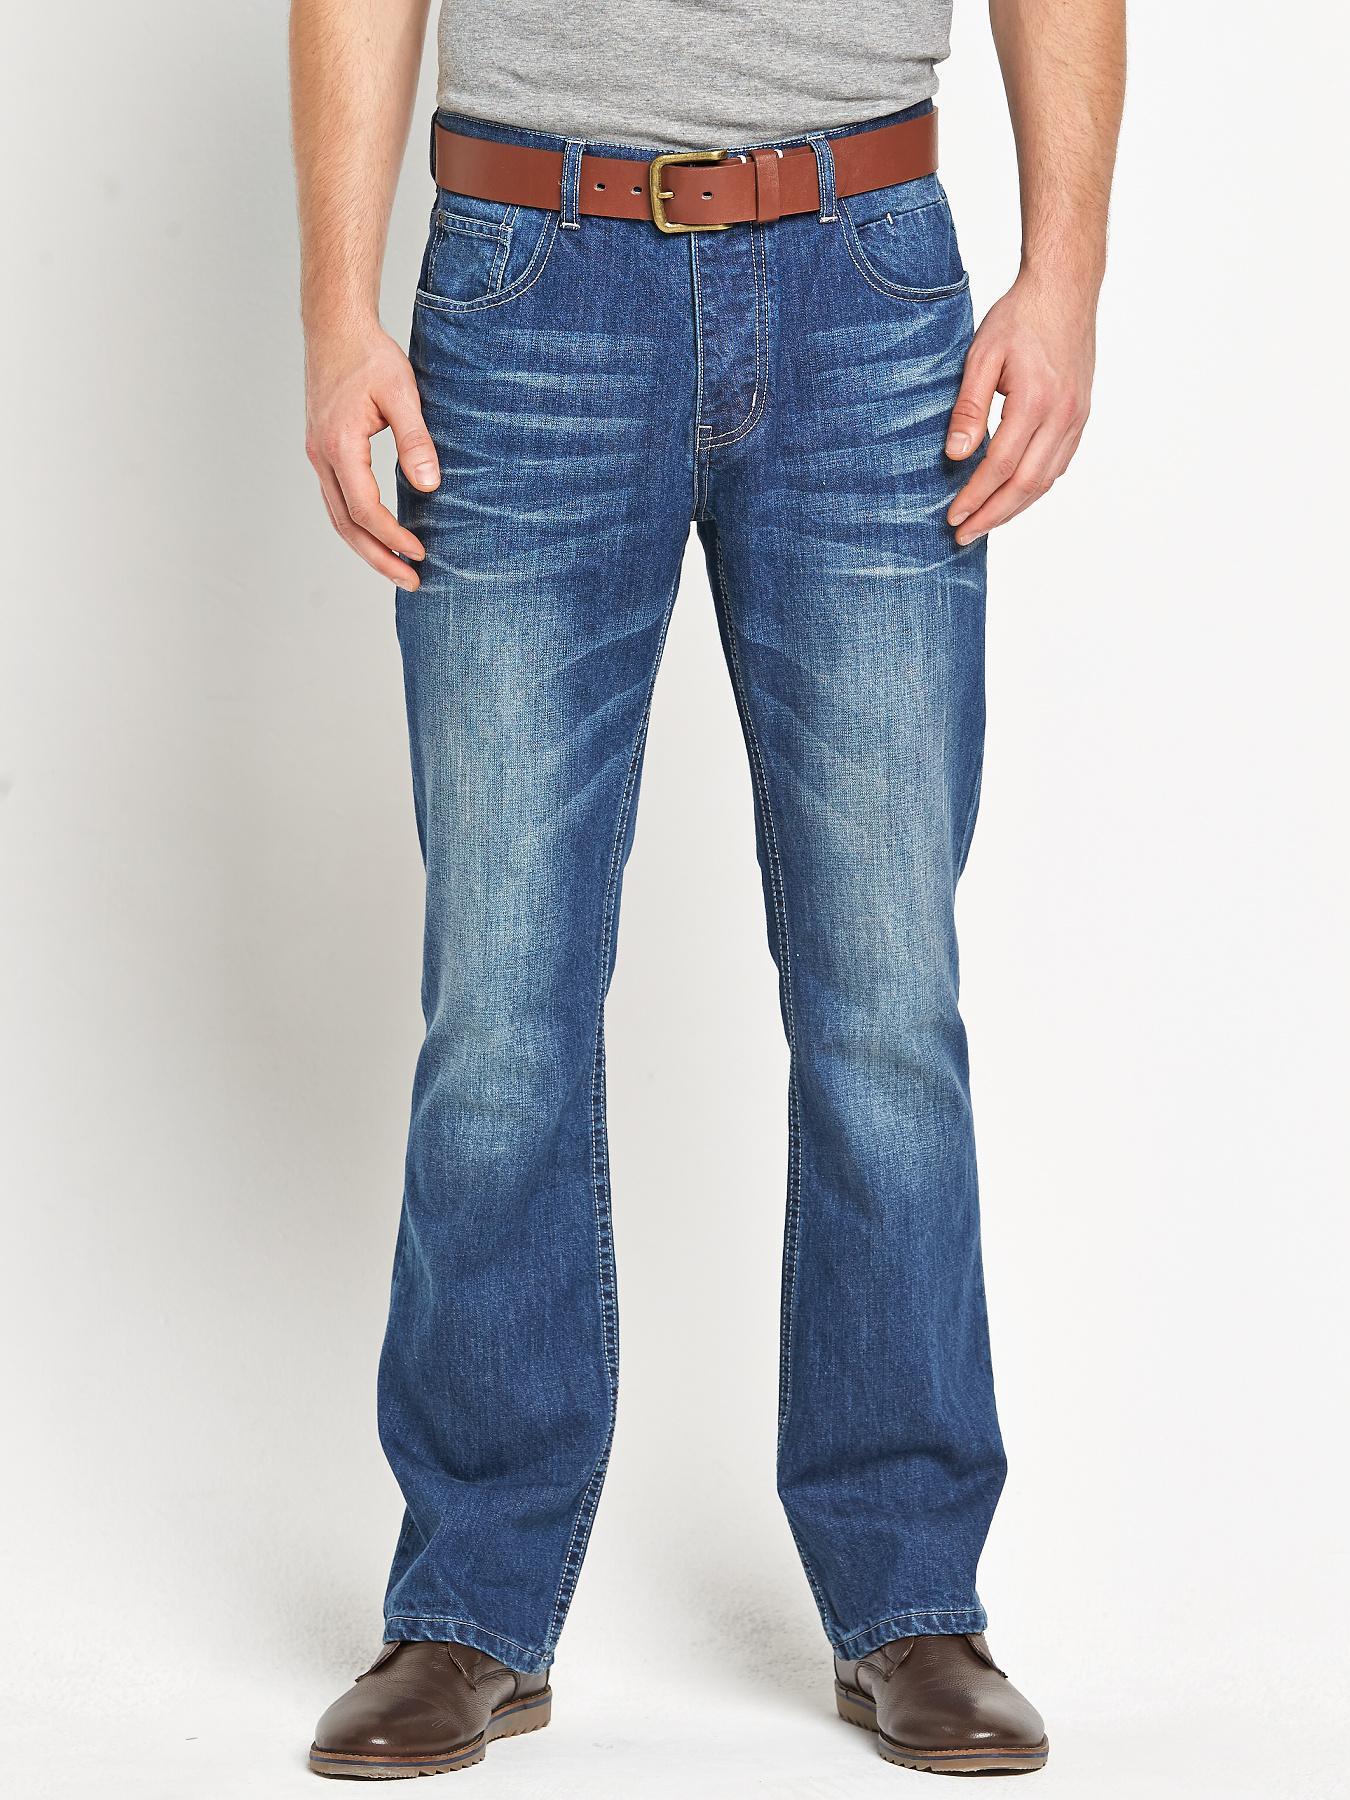 Mens Belted Bootfit Mid Blue Wash Jeans, Blue at Littlewoods